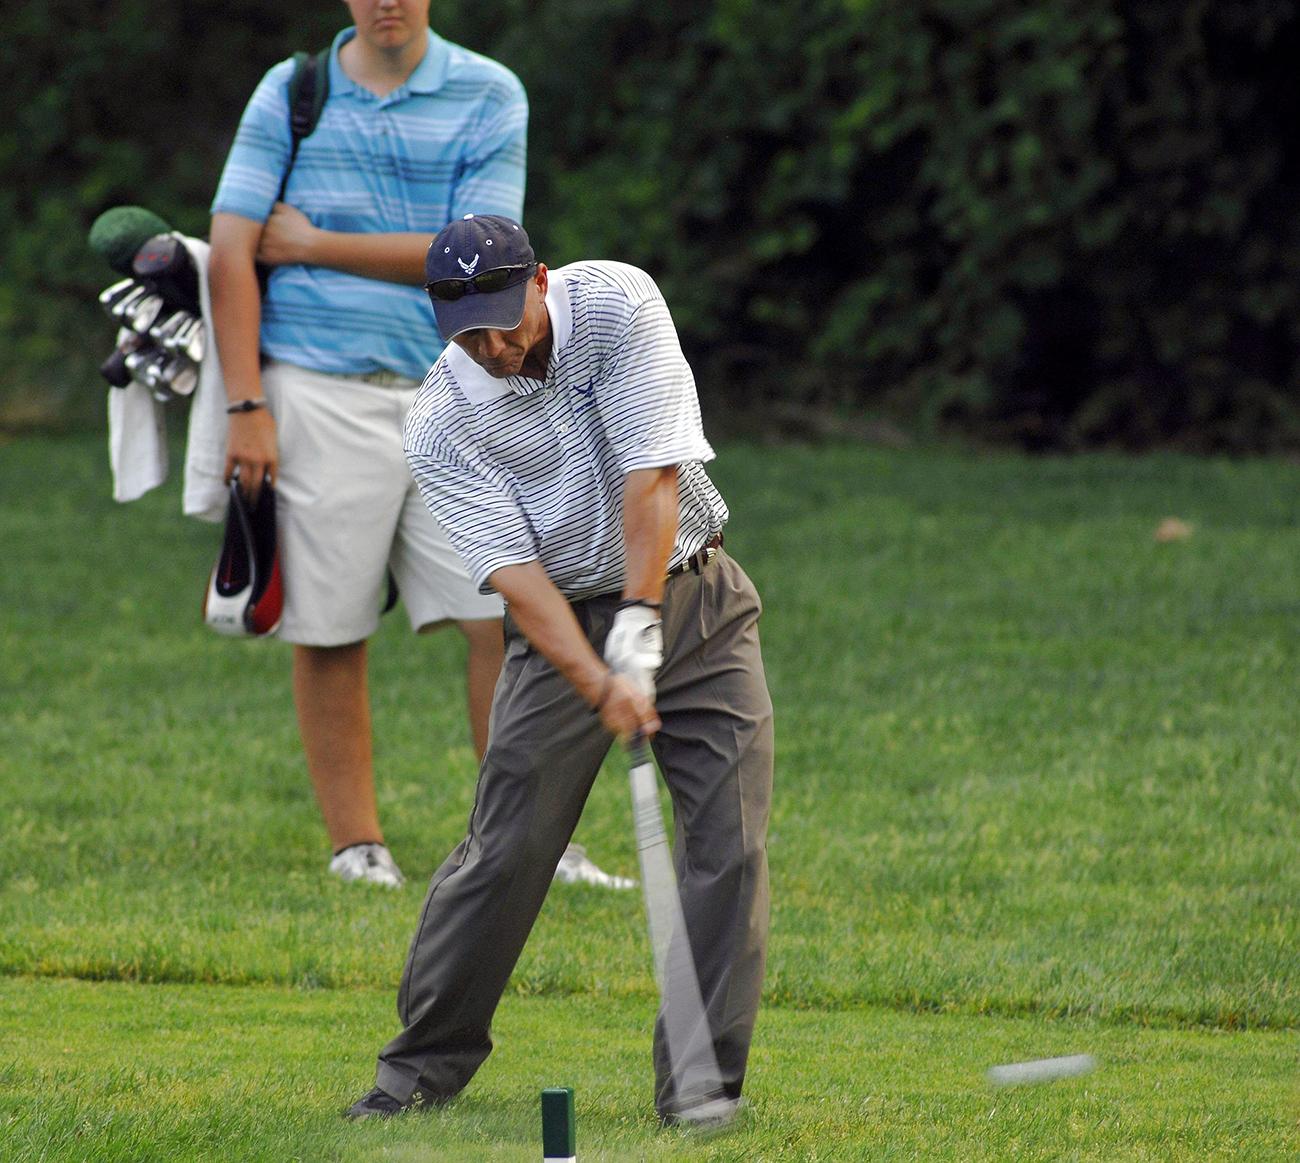 Victory_Golfworks_Virtual_Golf_Professional_Training_Year_Round_Golf_Cache_County_Utah_27